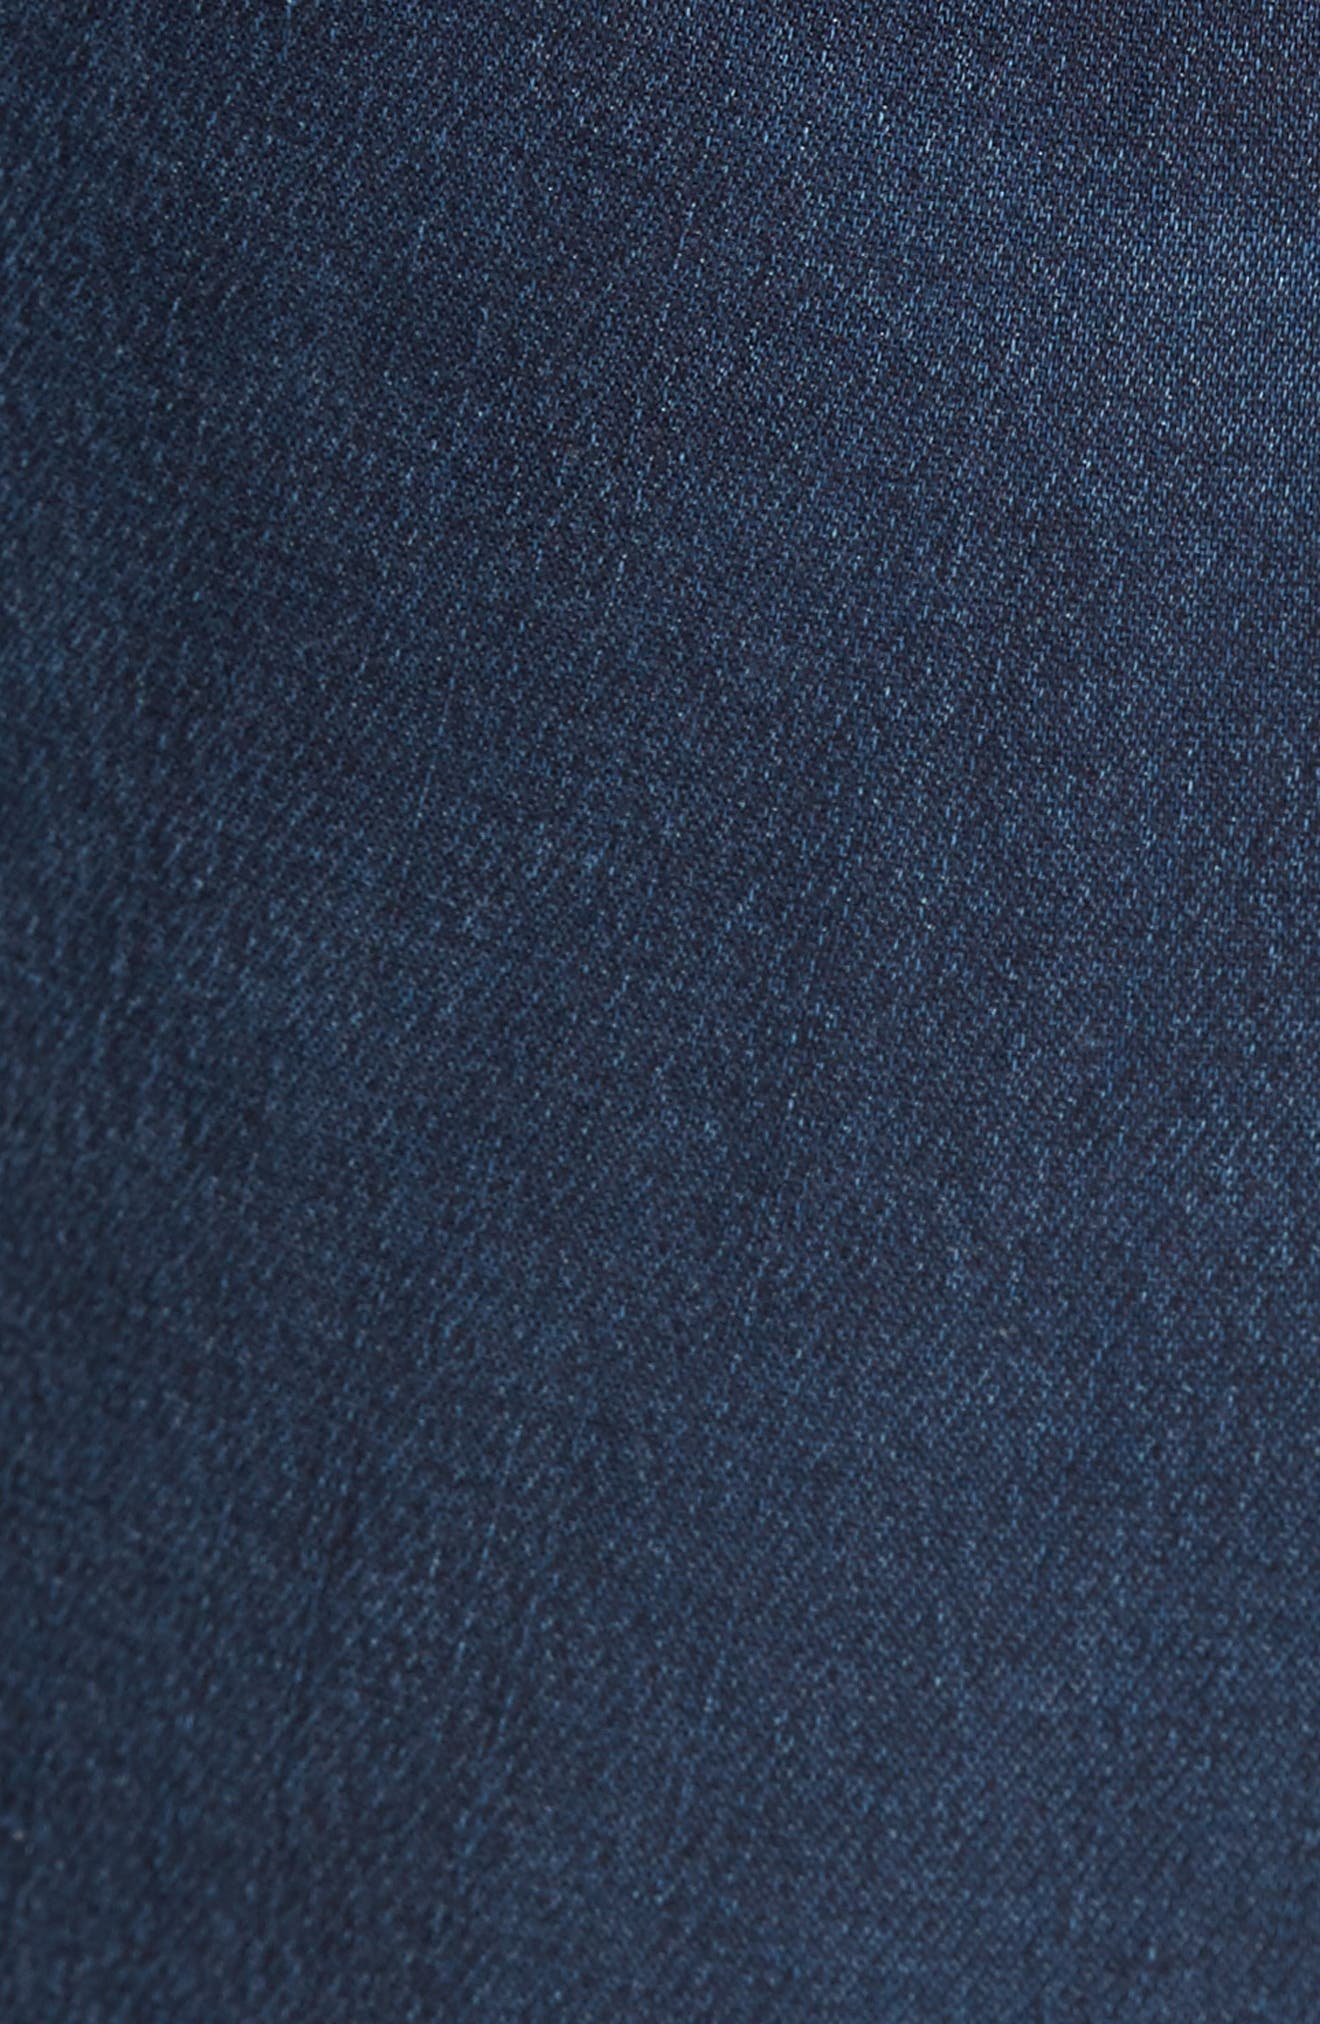 Thommer Slim Fit Jeans,                             Alternate thumbnail 5, color,                             0688J